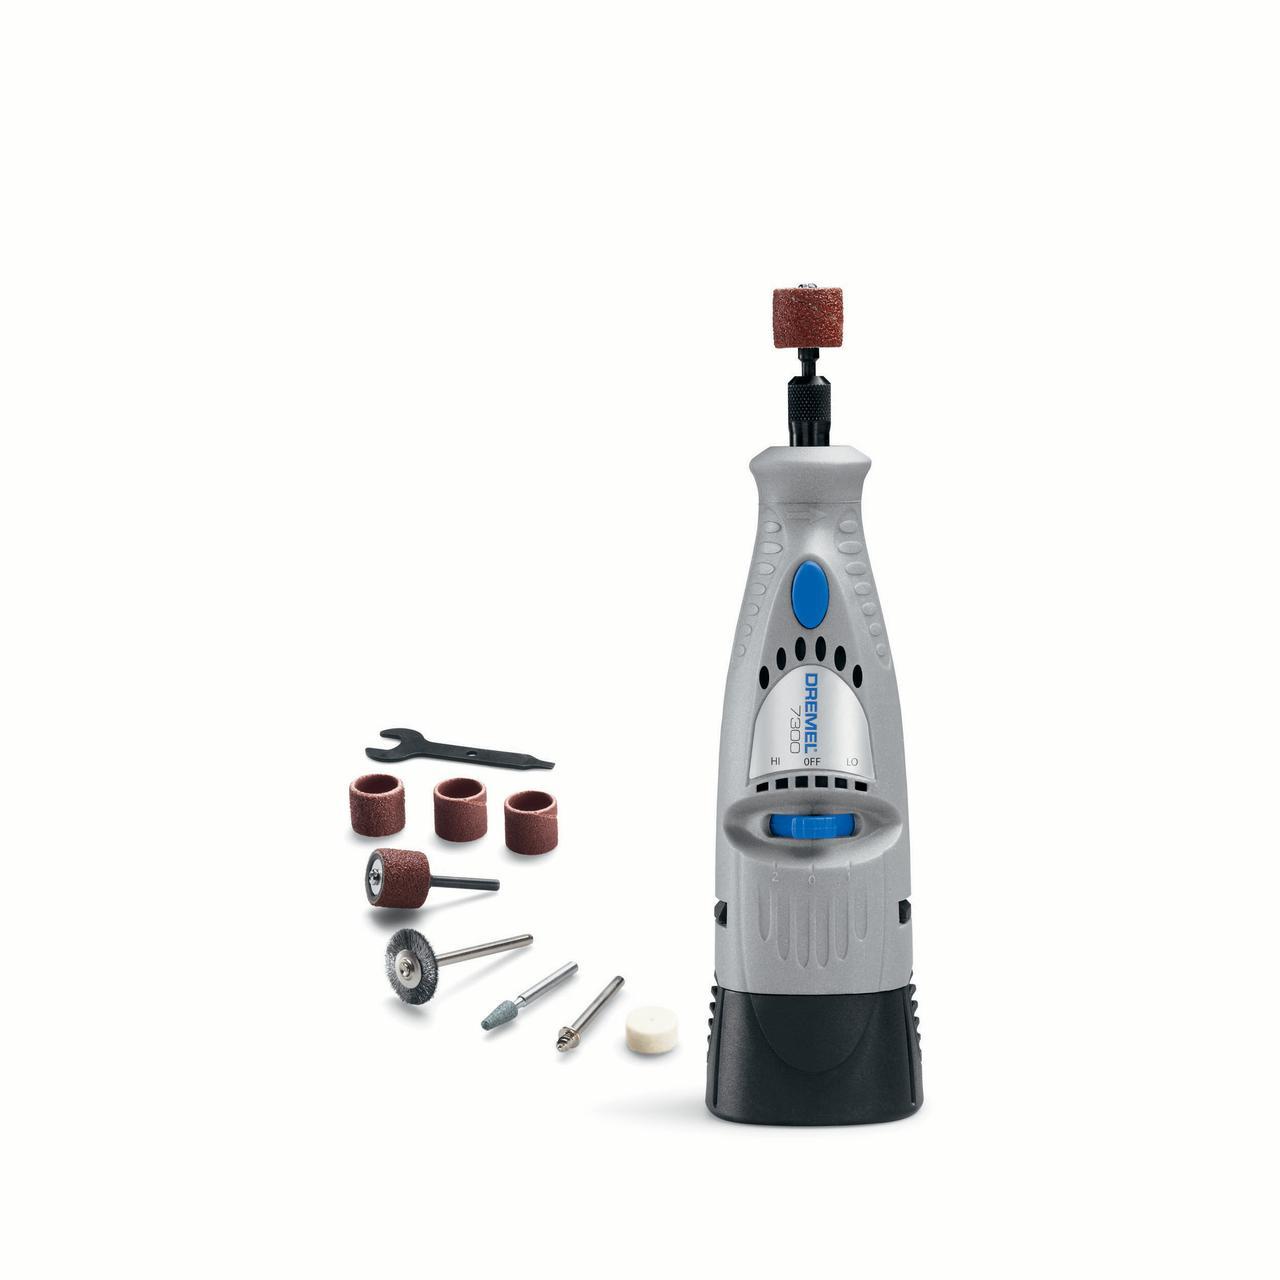 Dremel 7300-N/8 4.8V Cordless Two-Speed Rotary Tool Kit